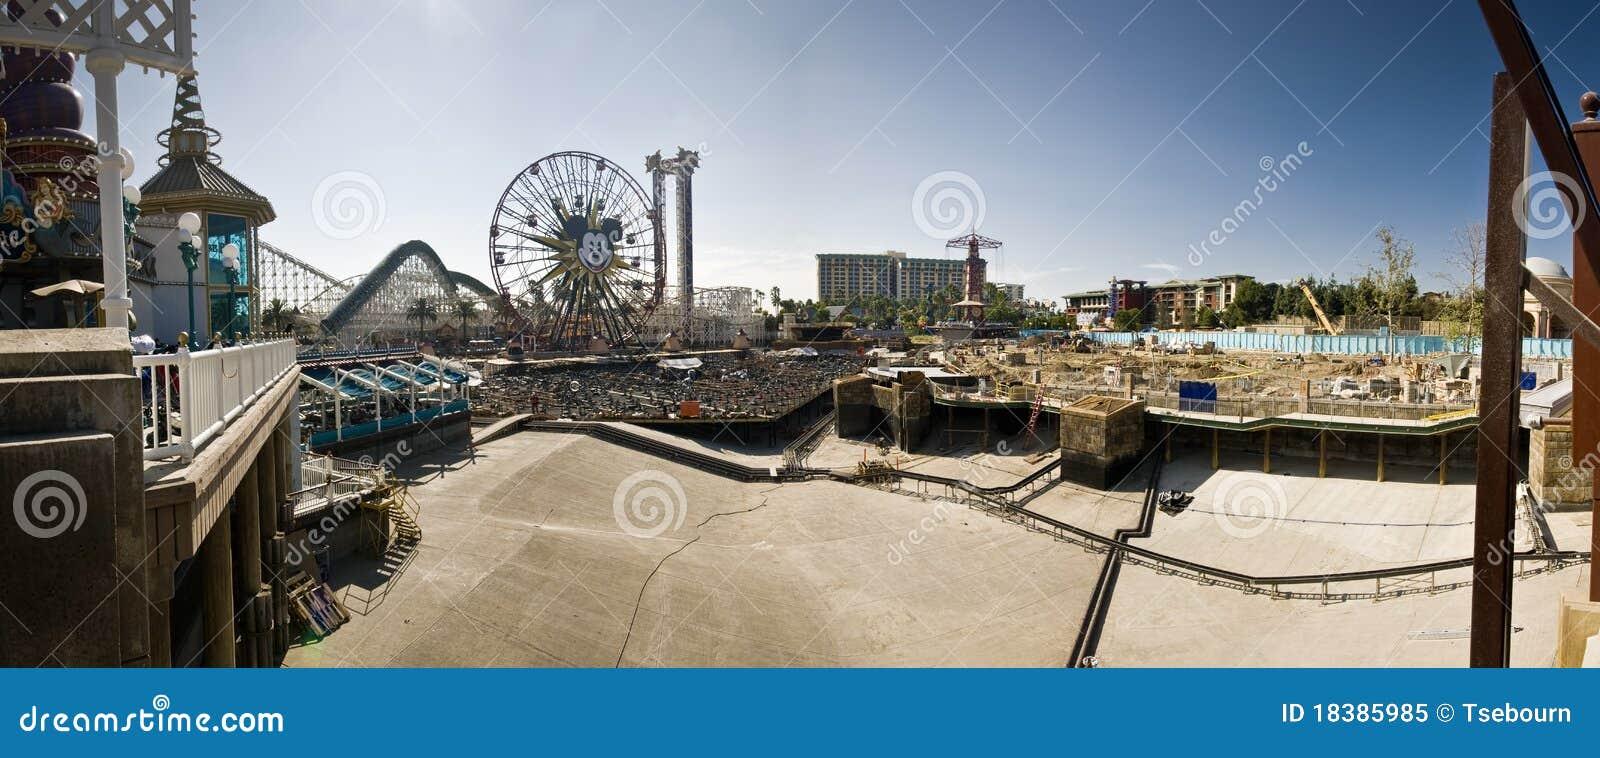 Disneyland California Adventure Construction Panor